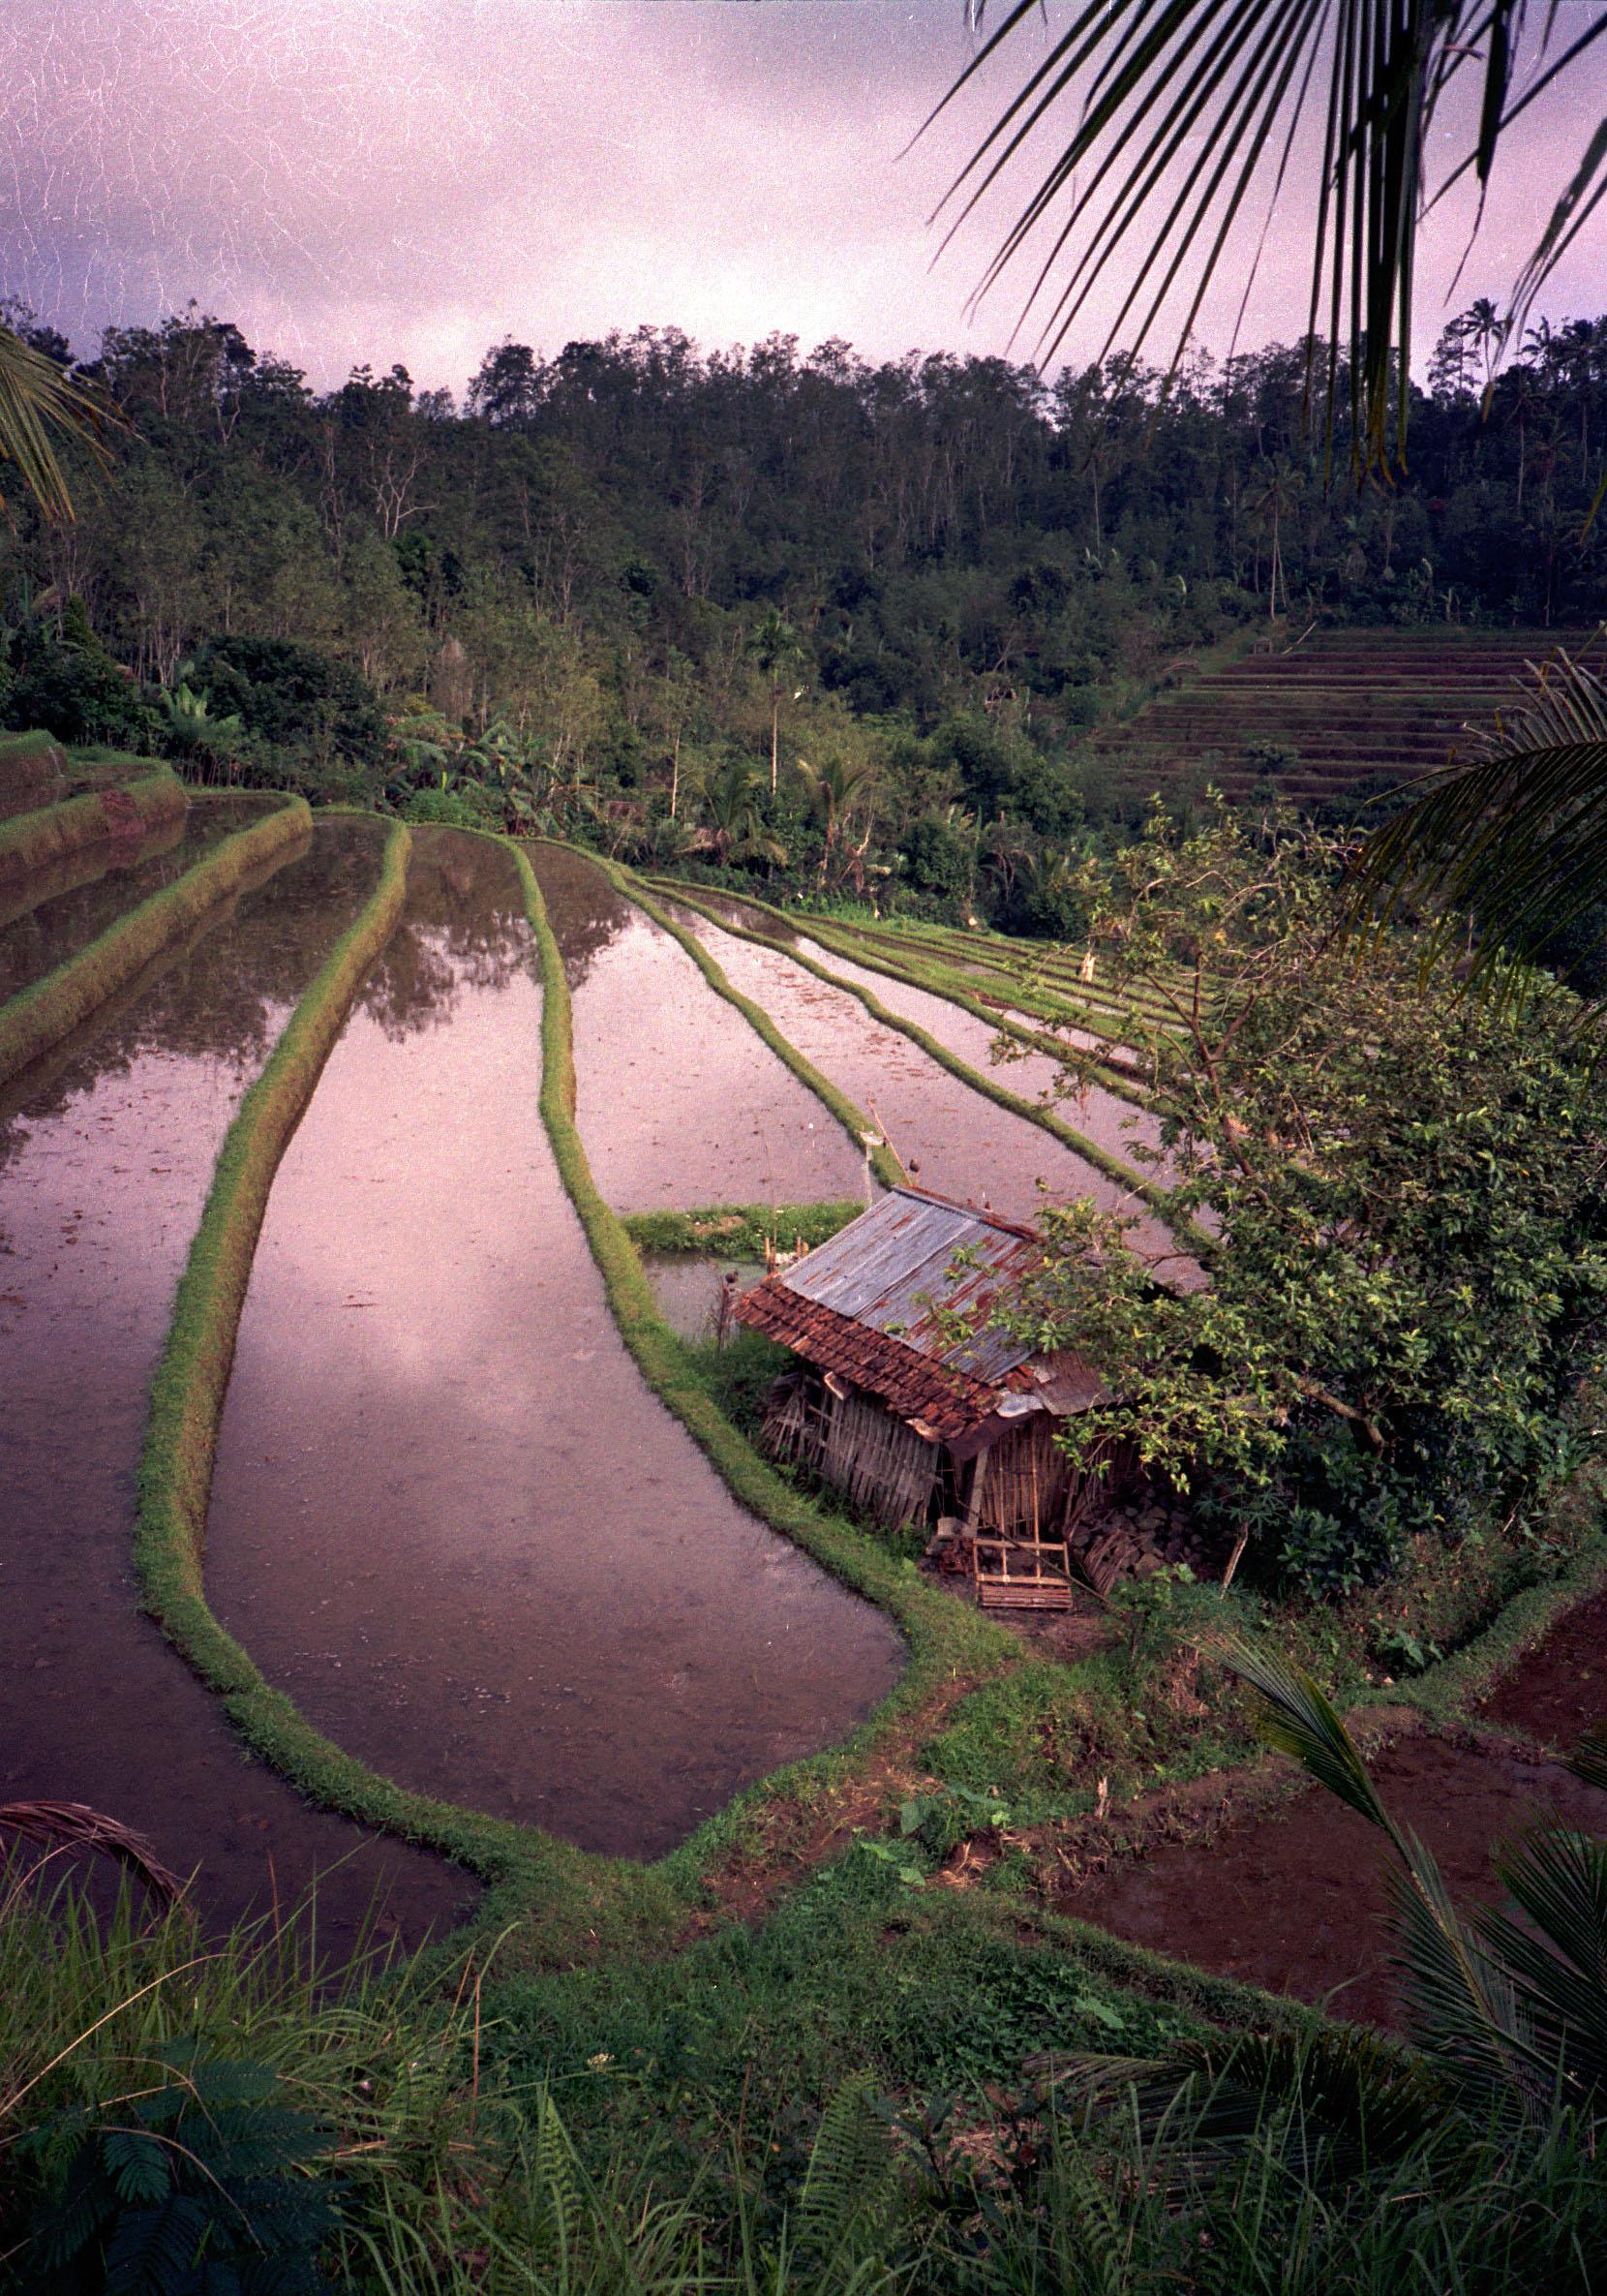 genuine \'bahay kubo\' nestling on Bali\'s rice terraces